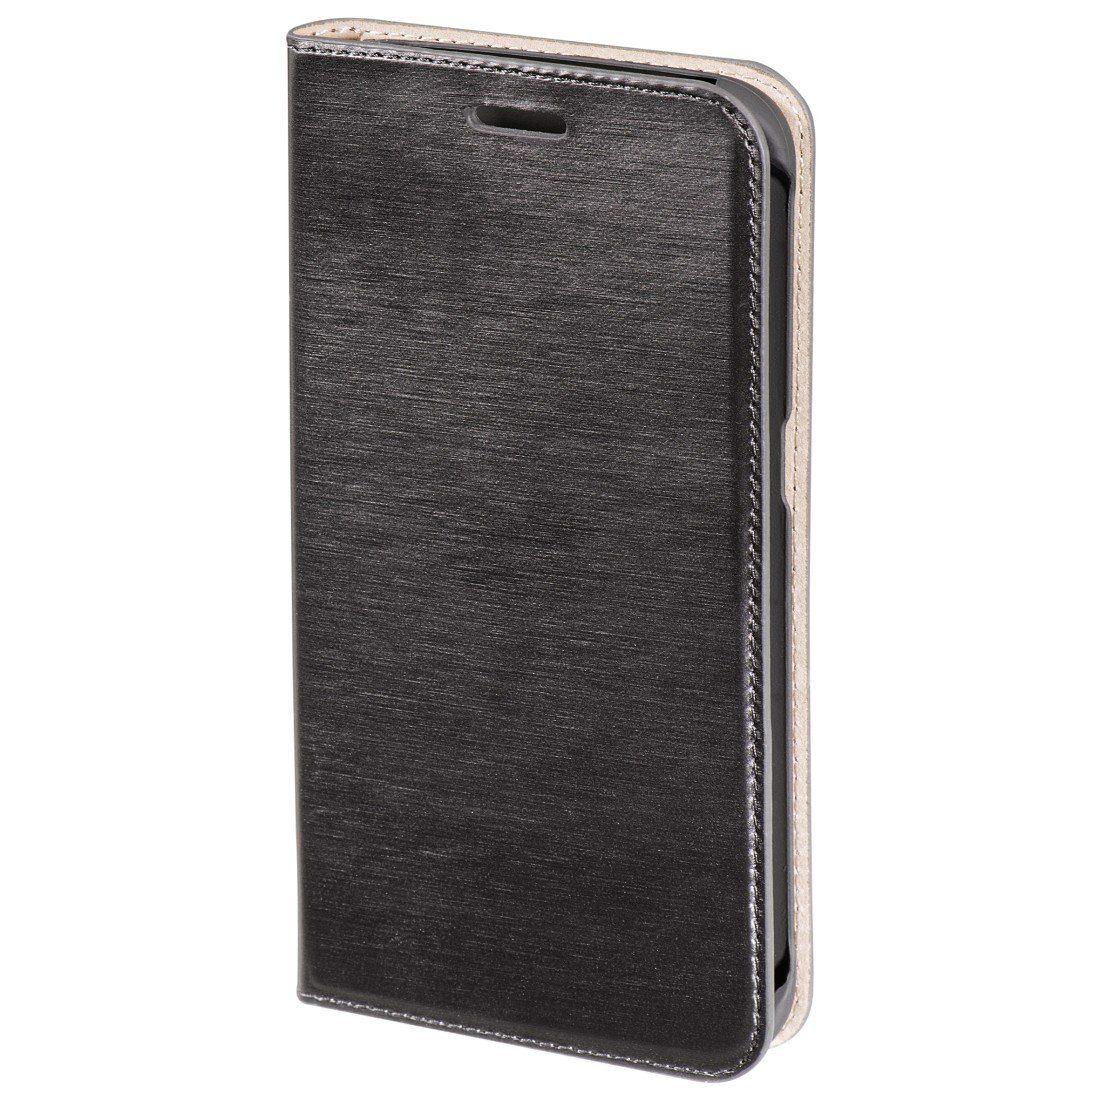 Hama Booklet Slim für Samsung Galaxy S6 Edge, Dunkelgrau